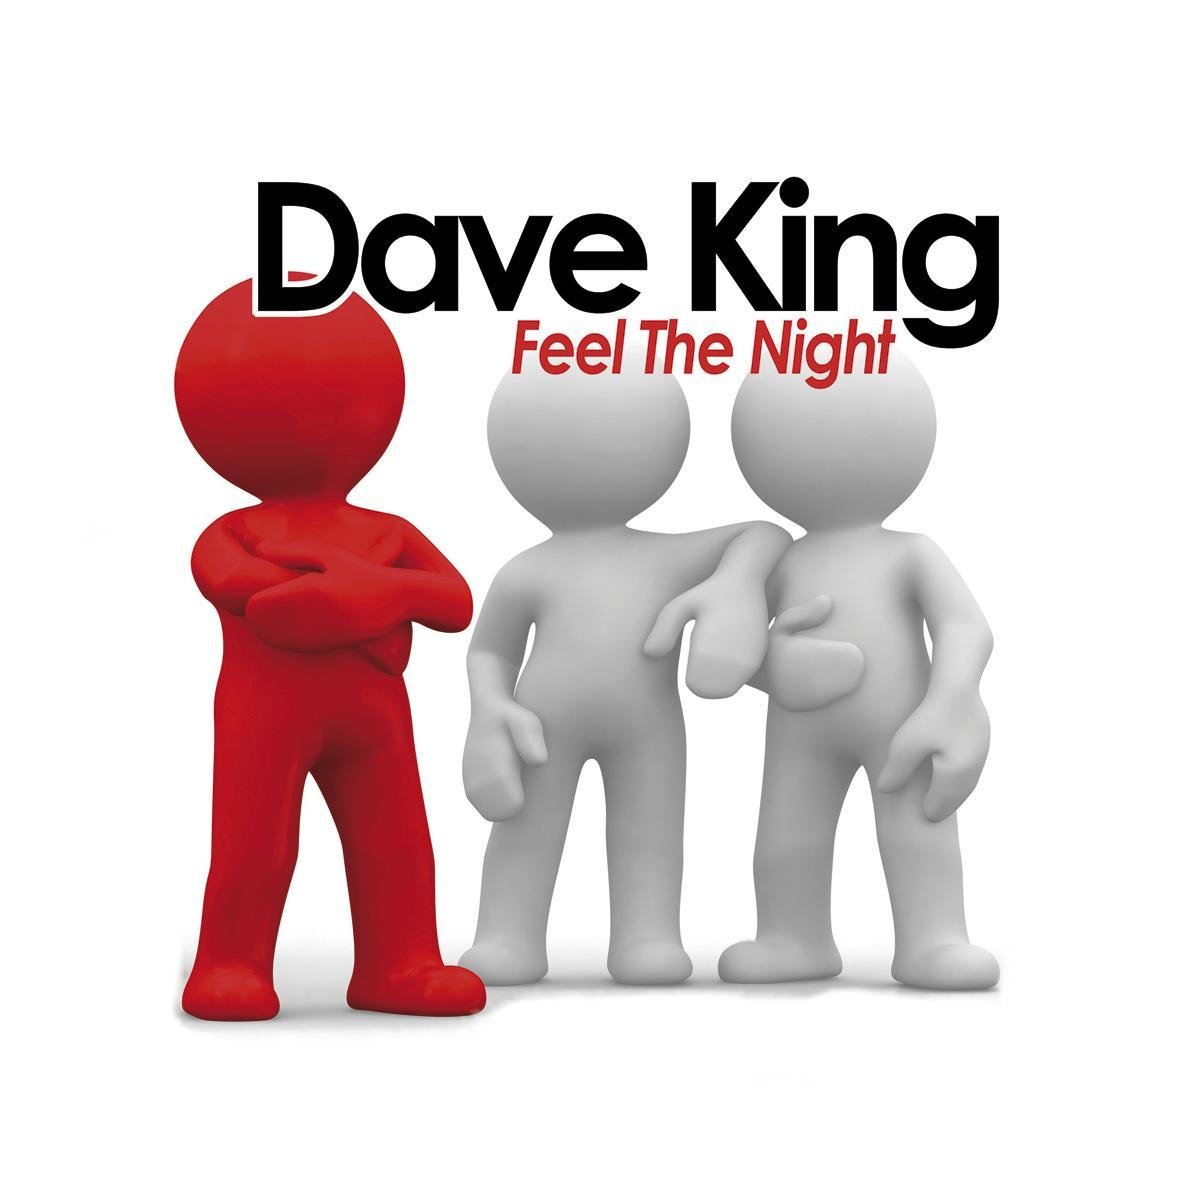 Кинг Дэйв Dave King. Feel The Night (LP) логан дэйв кинг джон фишер райт хэли лидер и племя пять уровней корпоративной культуры